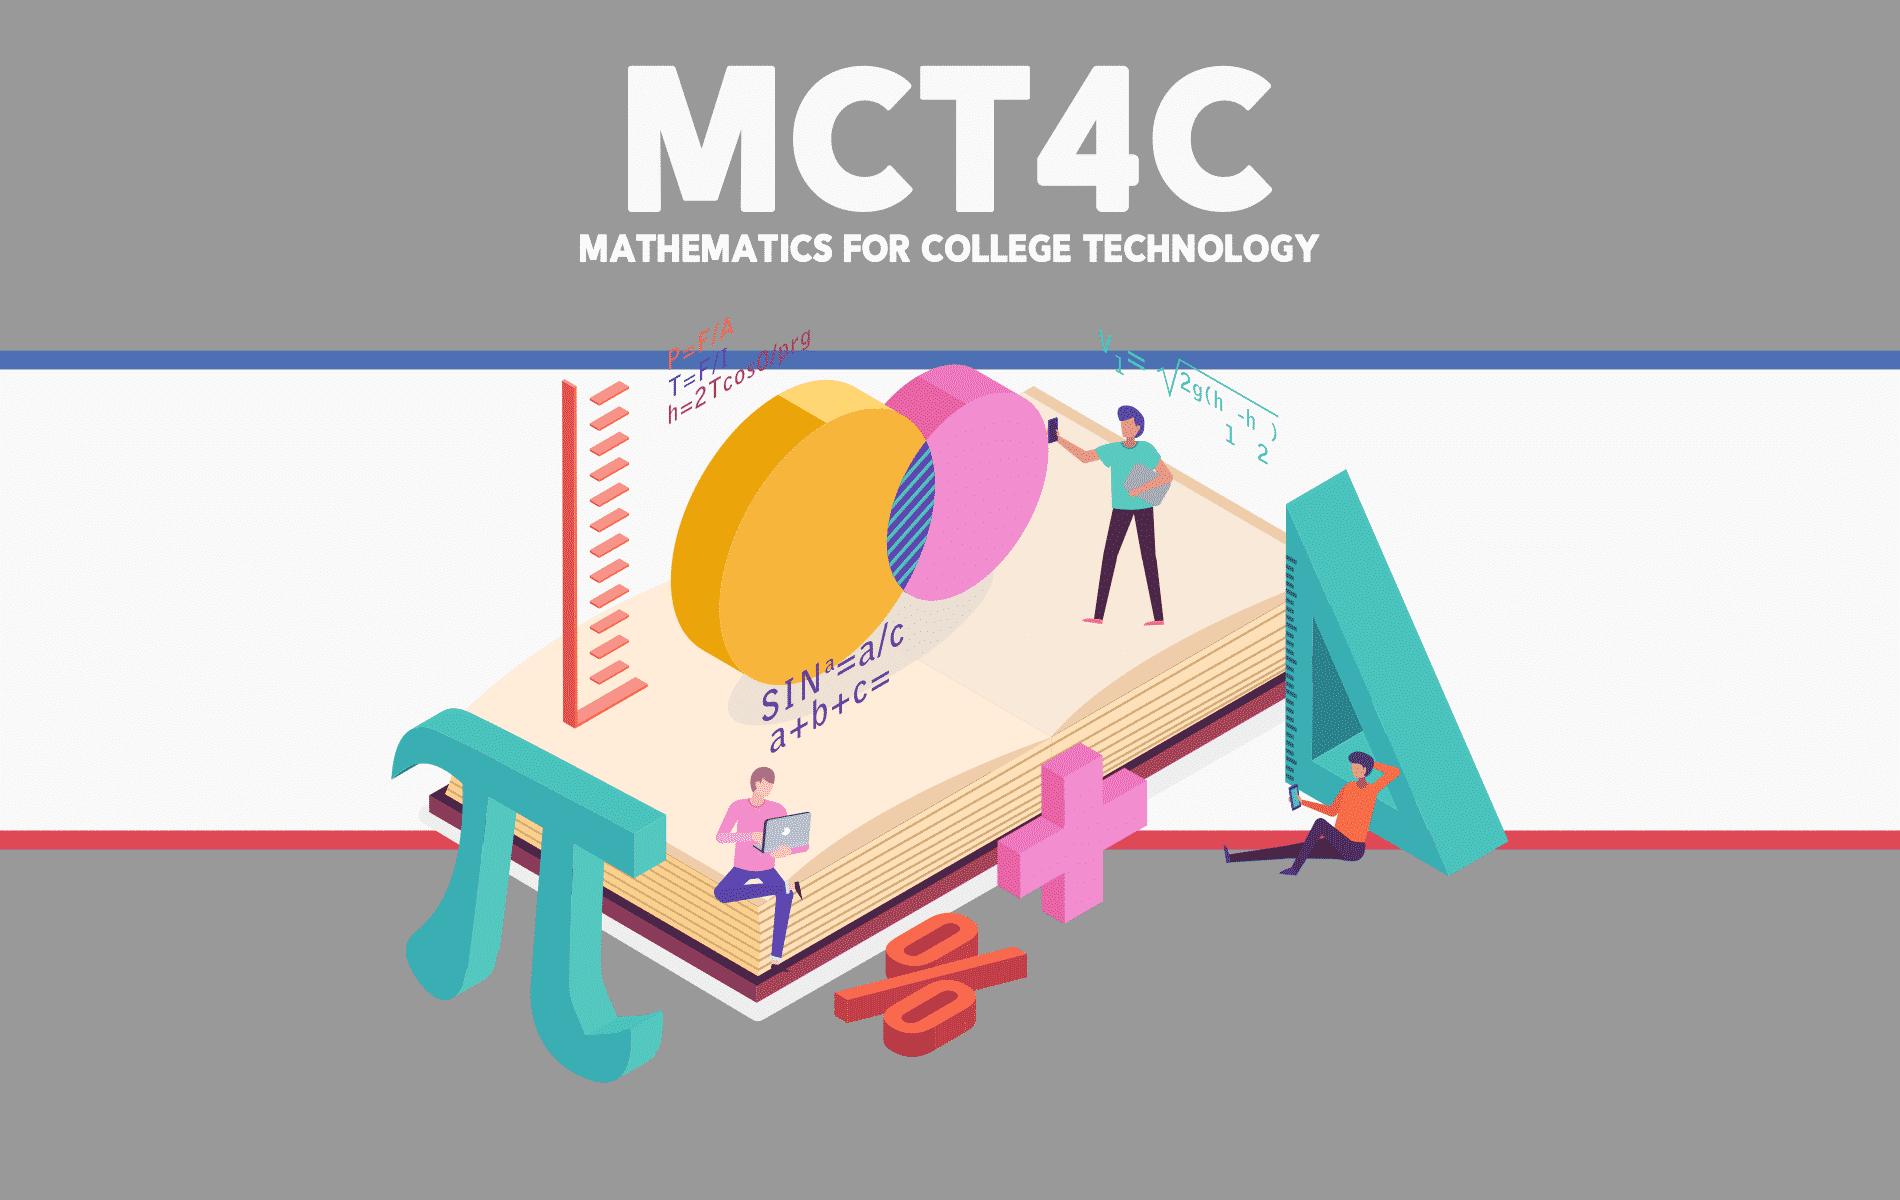 MCT4C